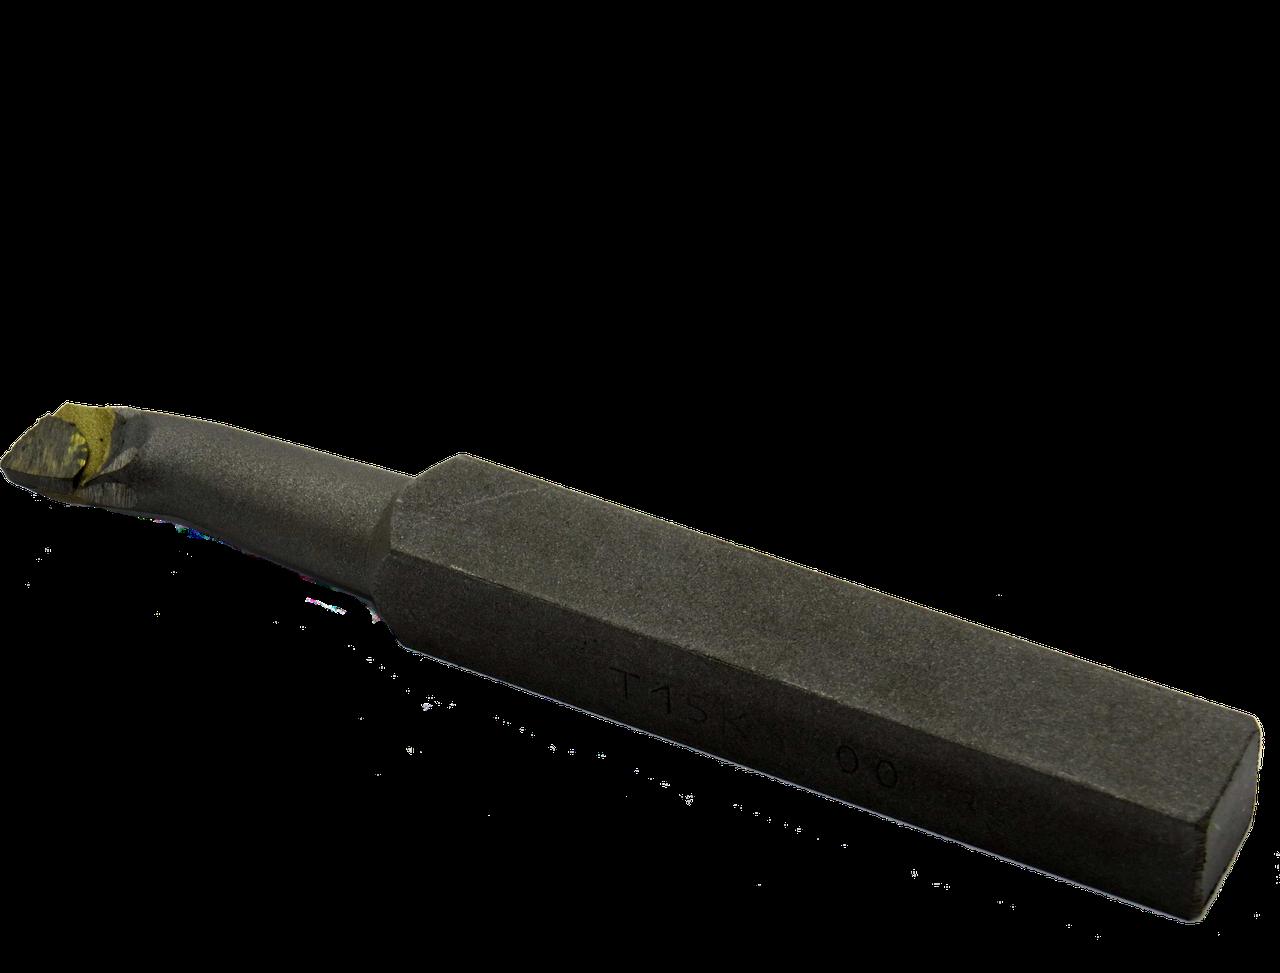 Резец 25х25х200 Т15К6 расточной для глухих отверстий СИТО Беларусь